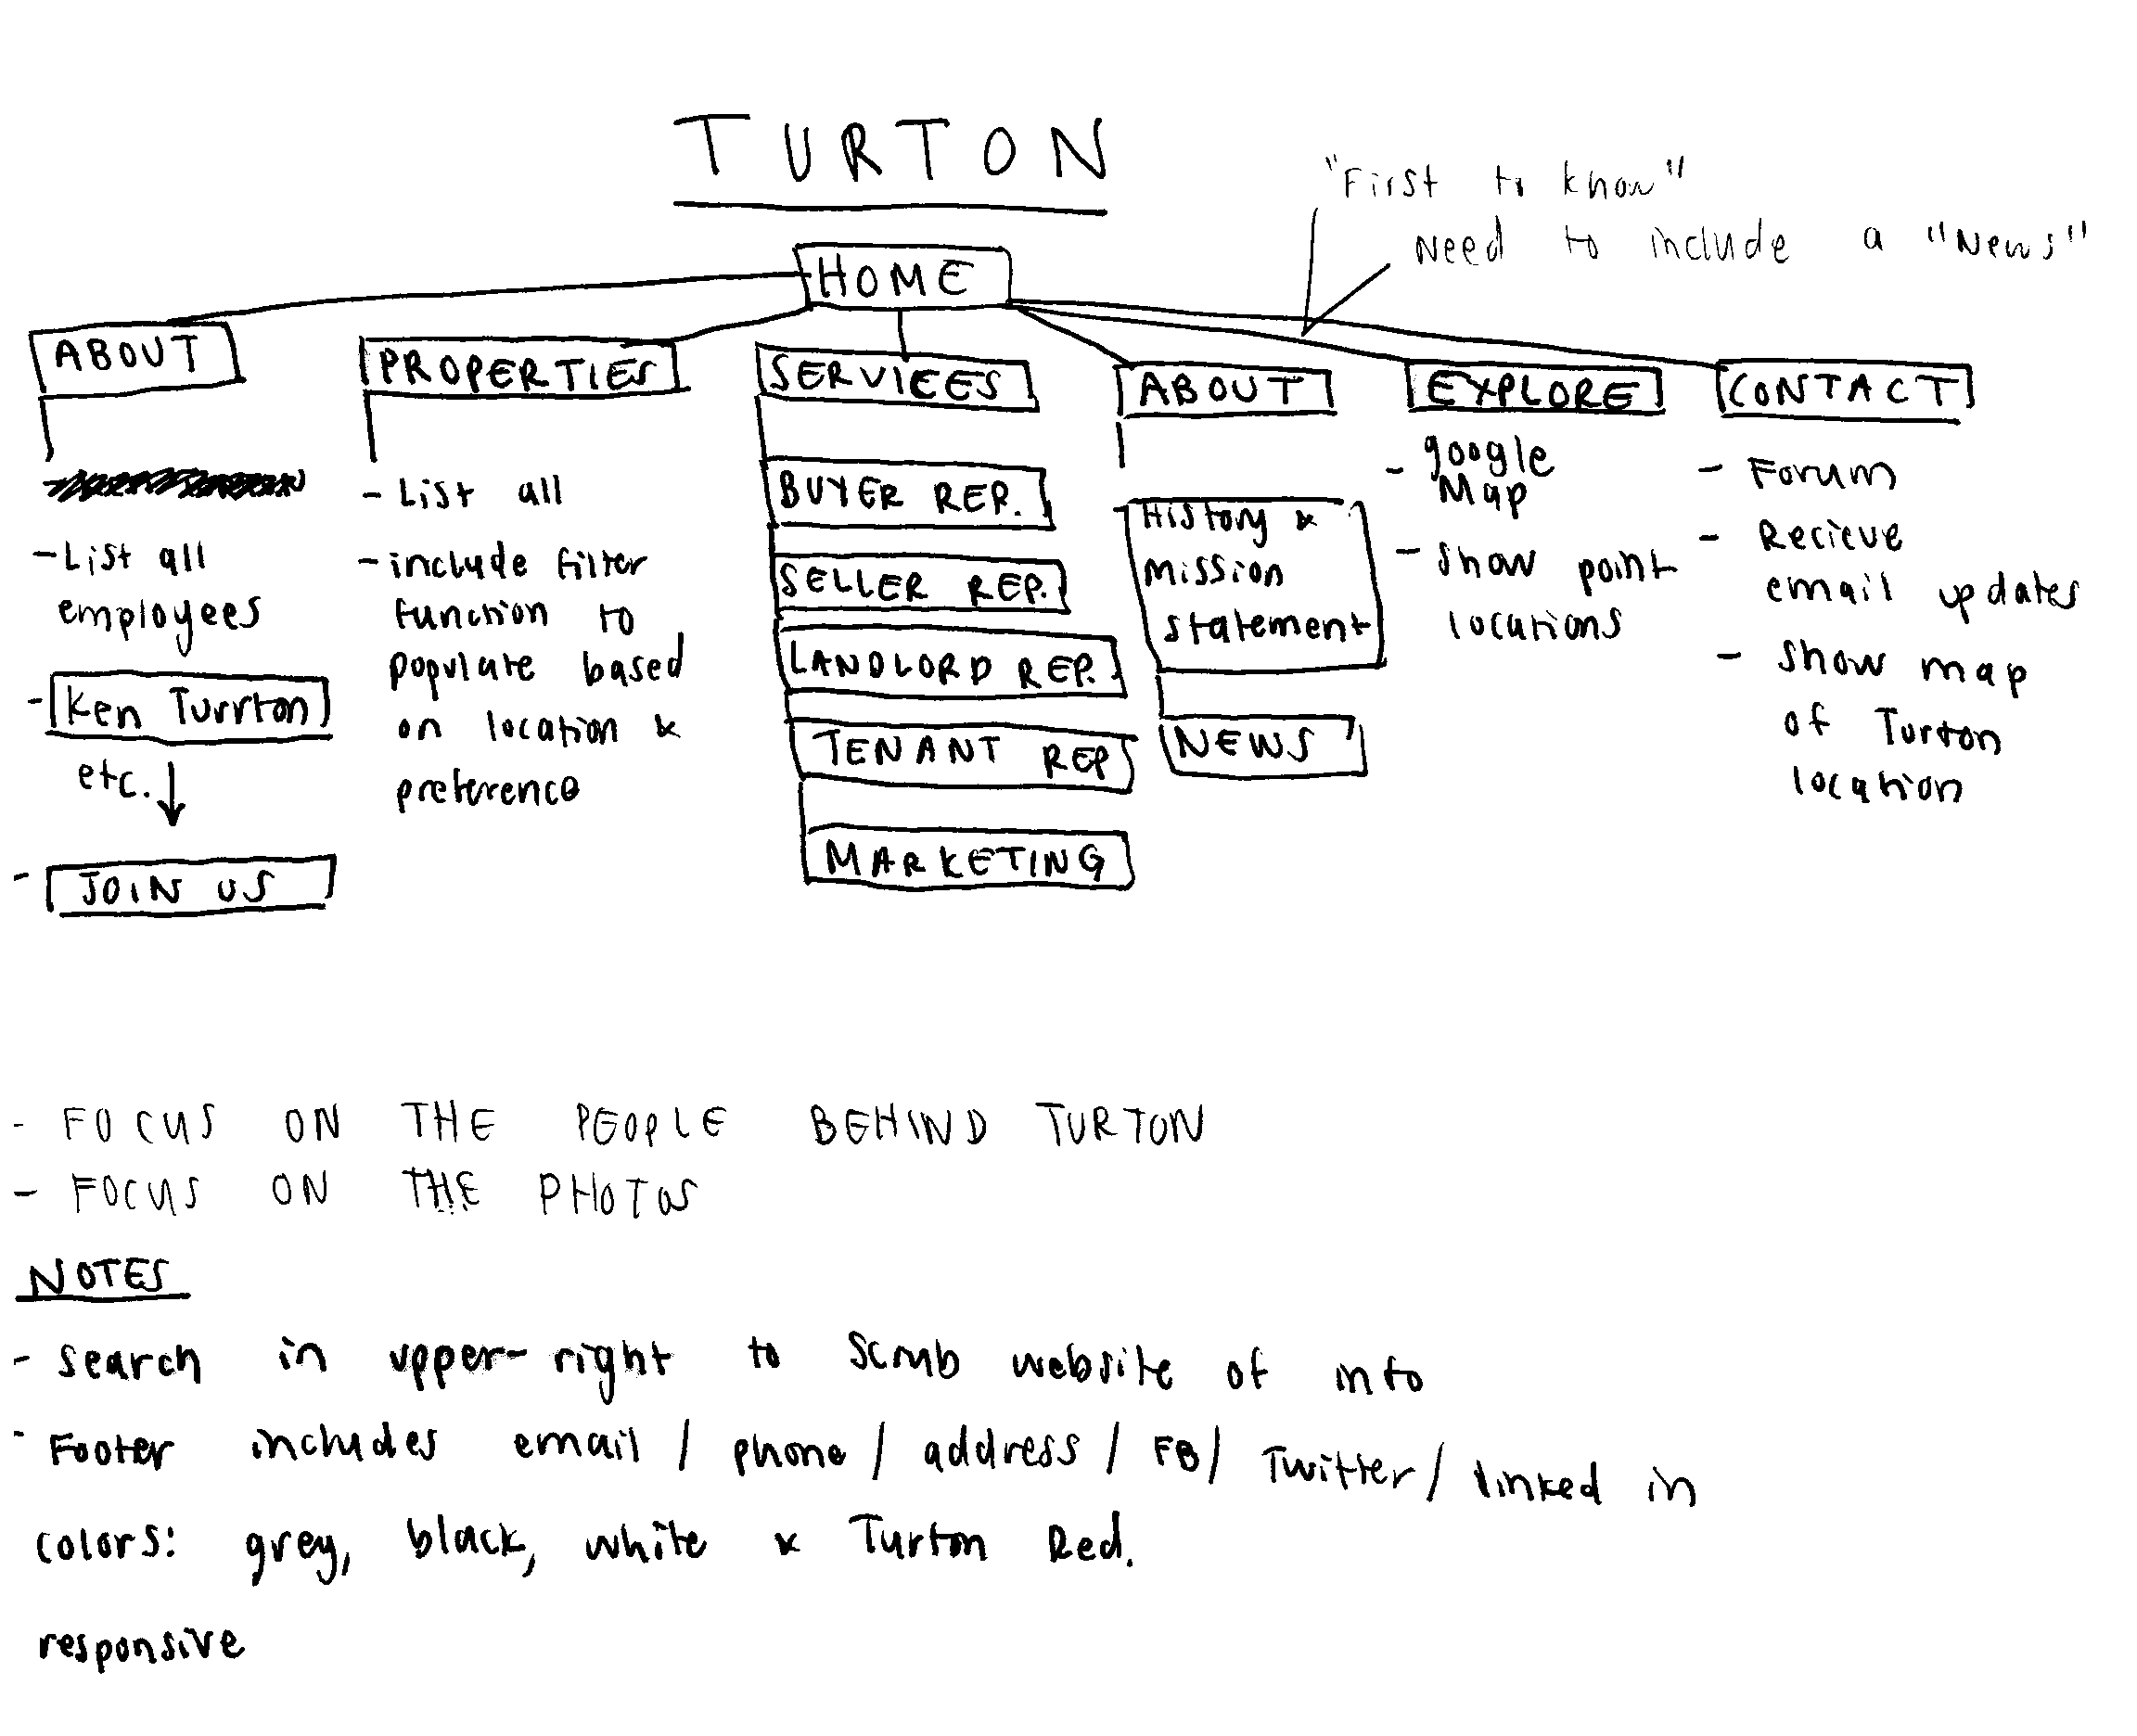 Turton.jpg